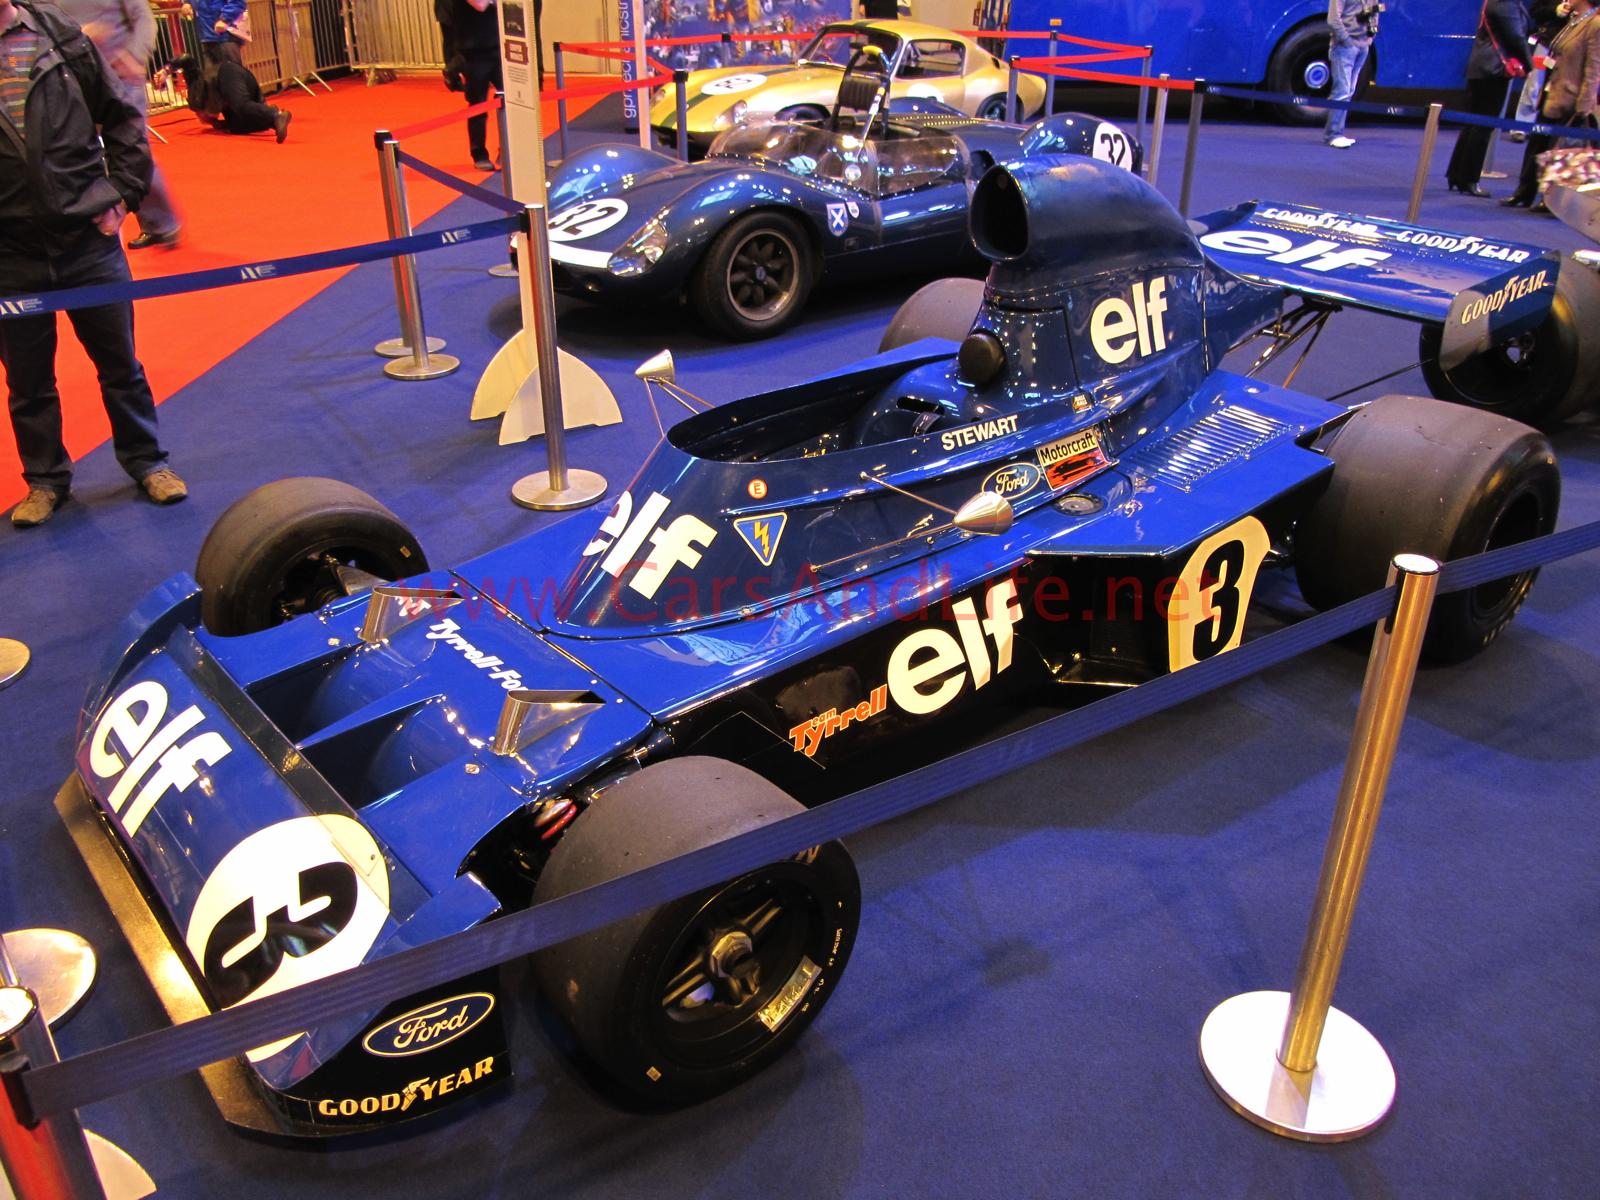 Autosport International 2017 >> Tyrrell Racing in Autosport International 2013 - cars & life